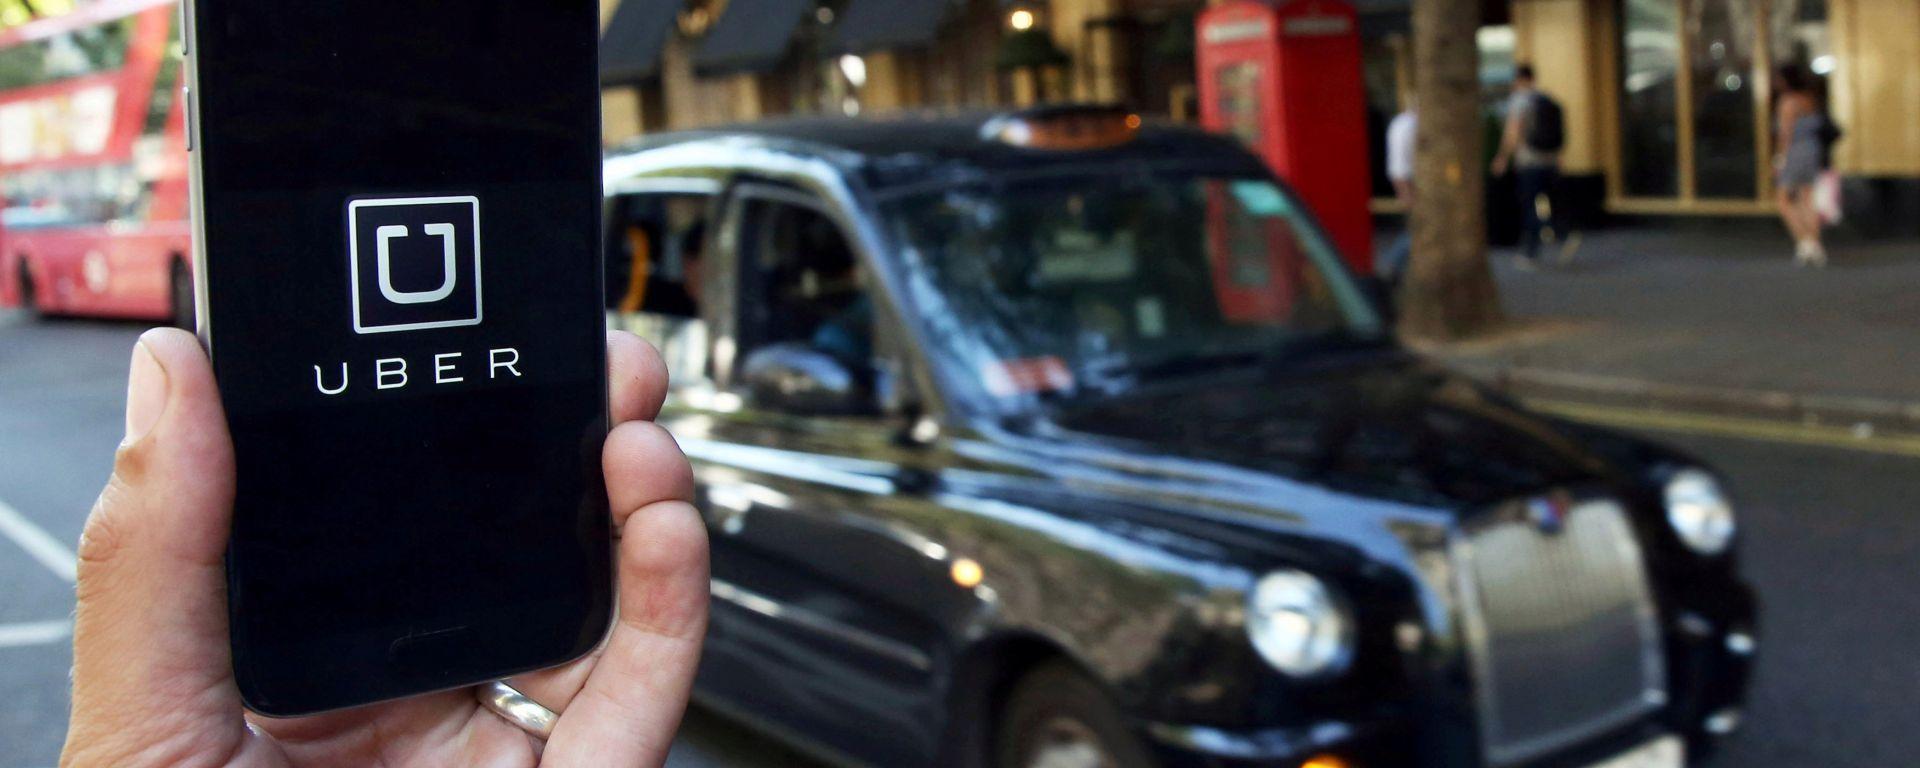 Uber e Lyft a Londra aumentano le emissioni di CO2